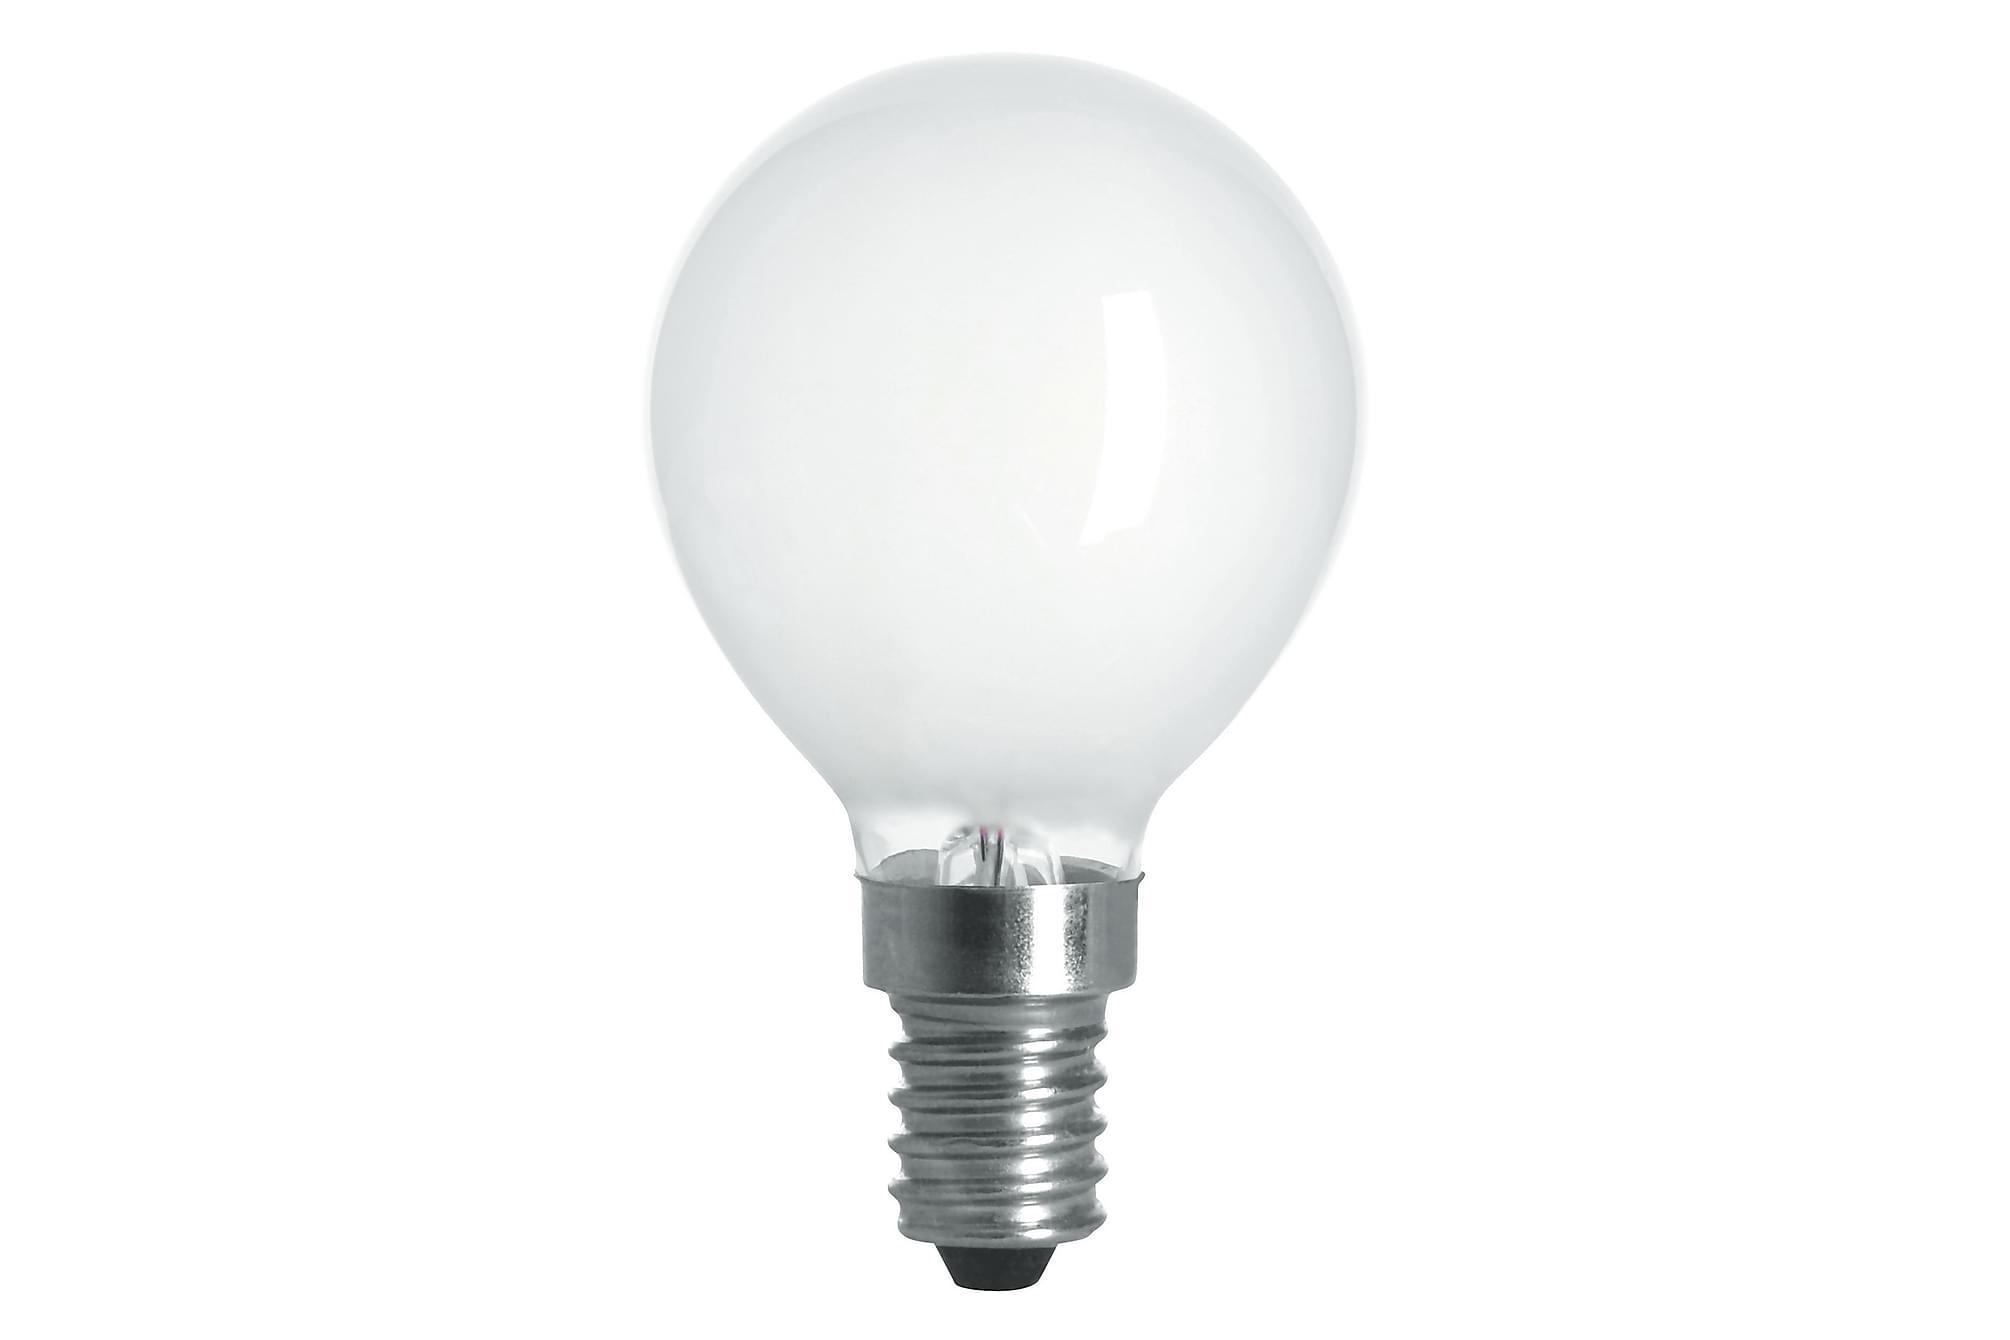 KIBBLE LED-lampa 1,8W E14 2700K Filament Opal, Glödlampor & ljuskällor